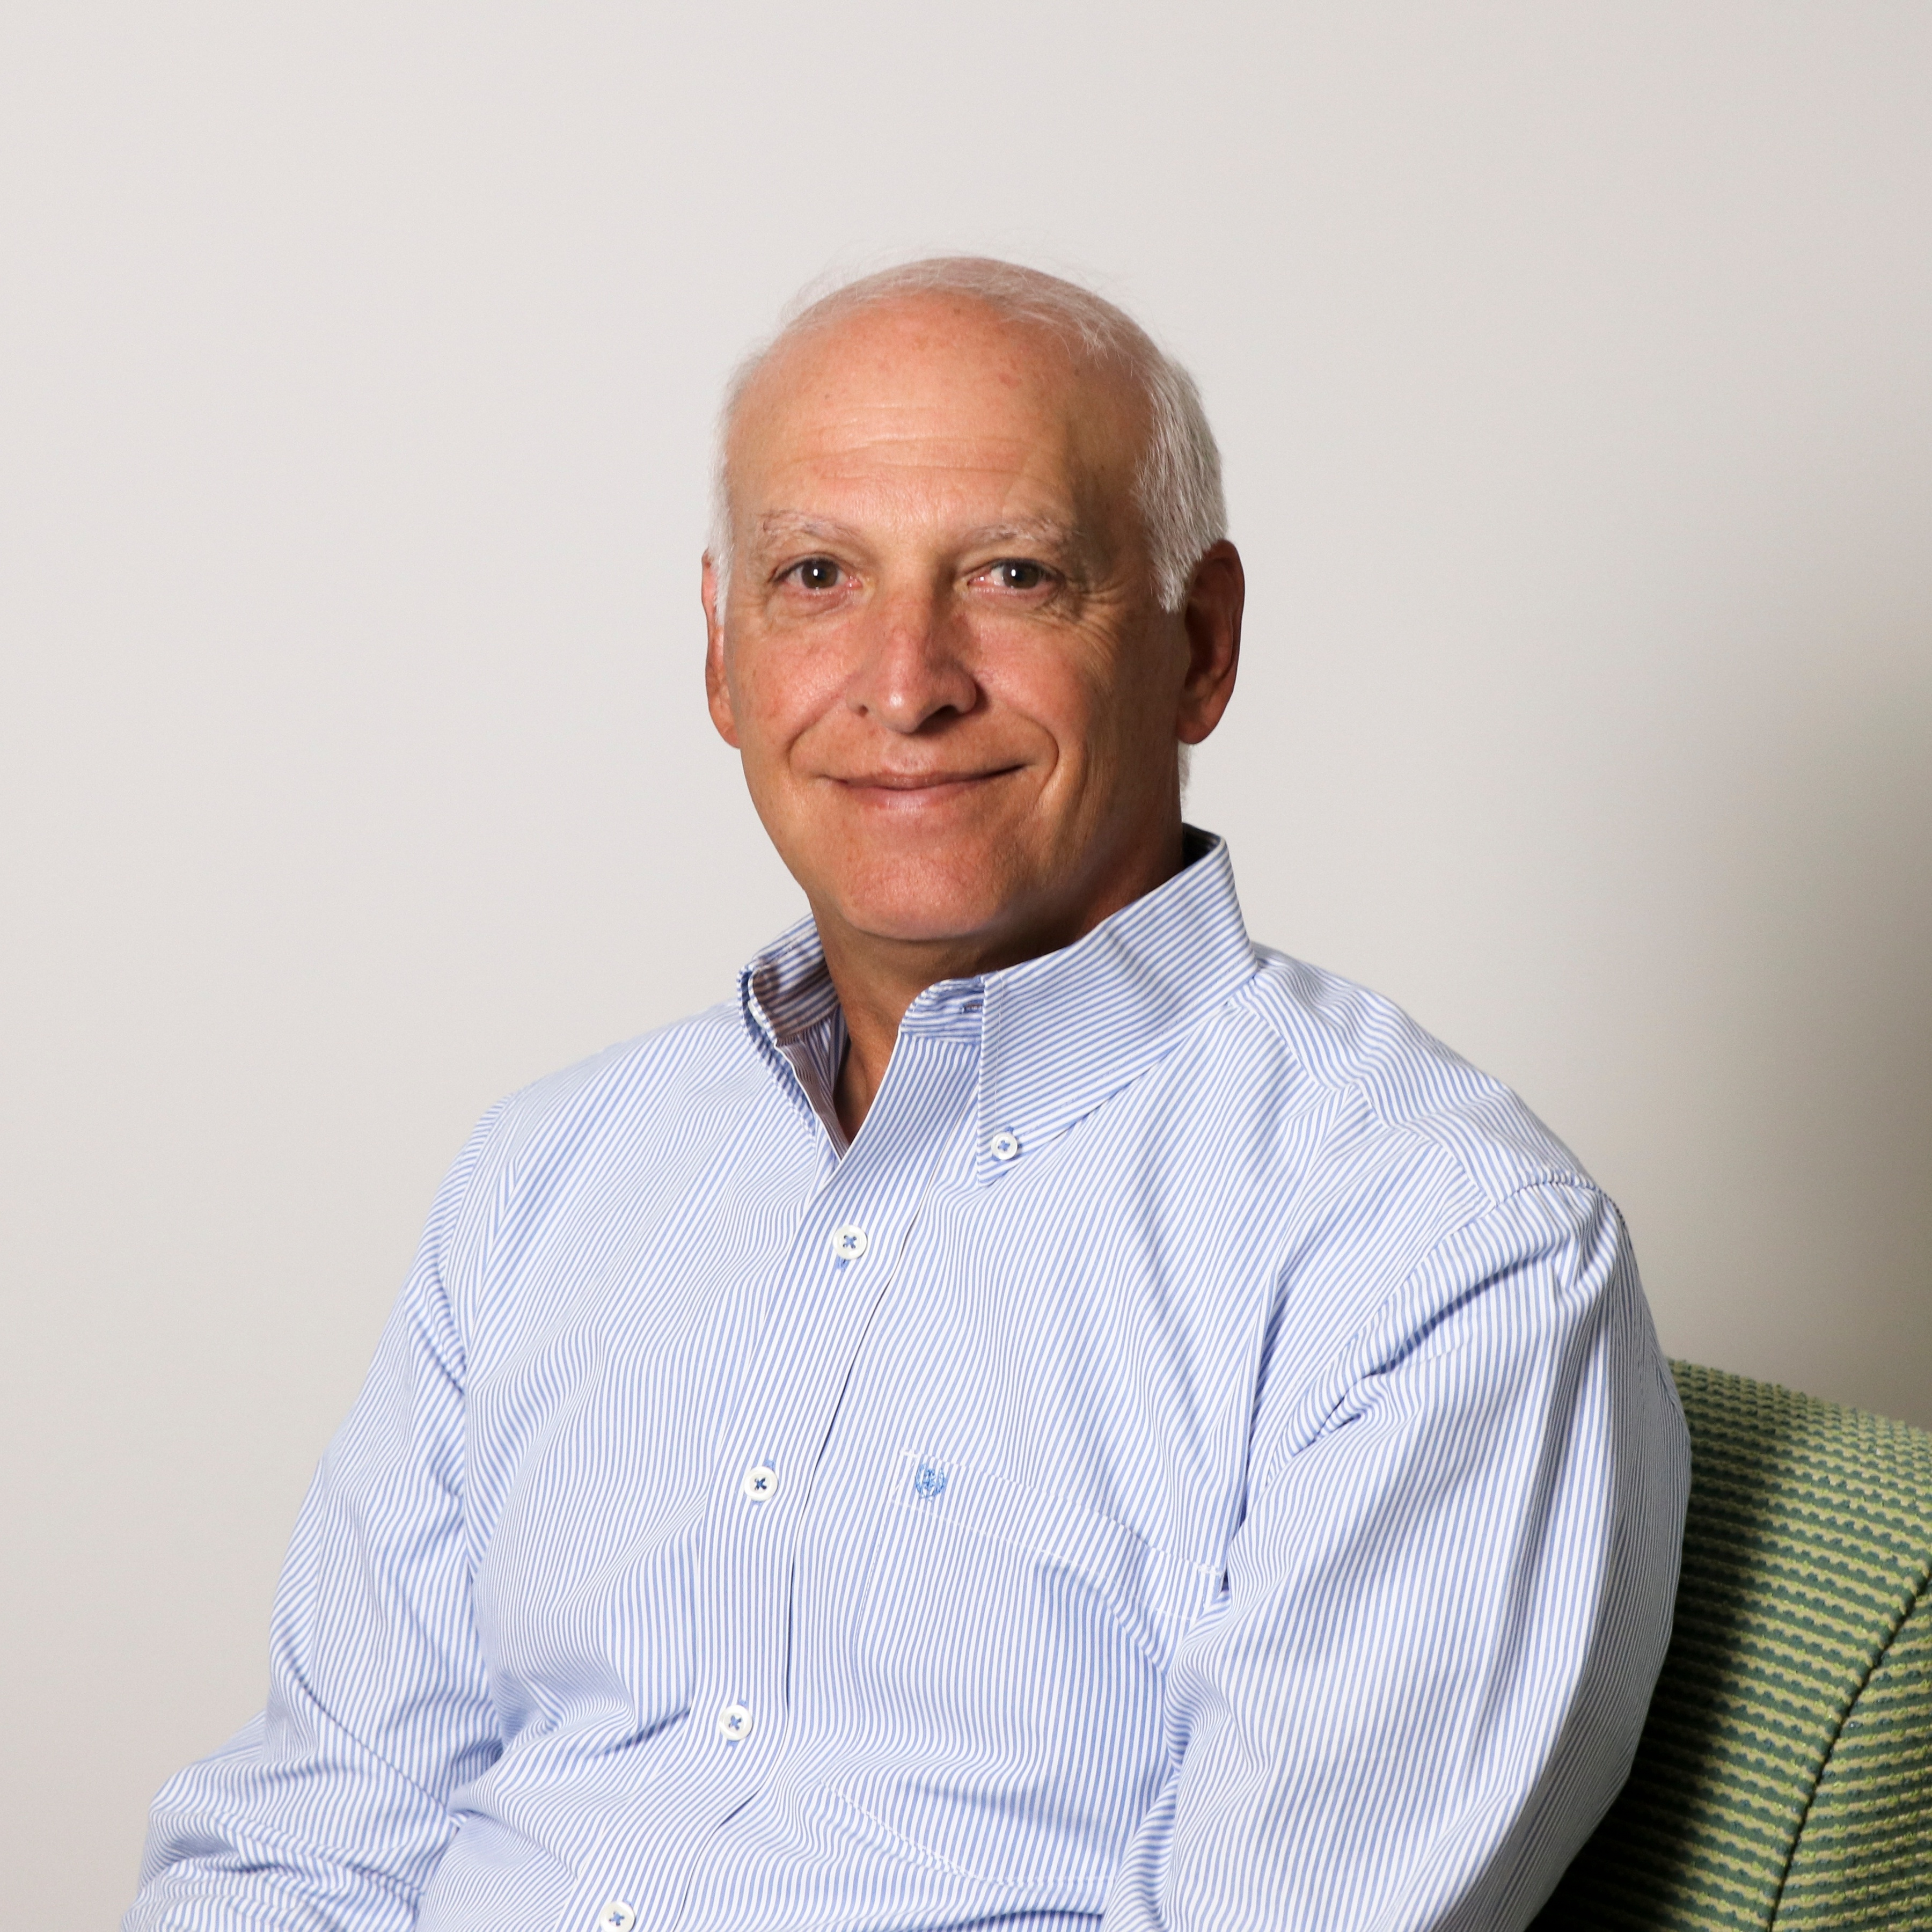 GLSC_Director_of_Finance_Joe_Zbikowski.jpg